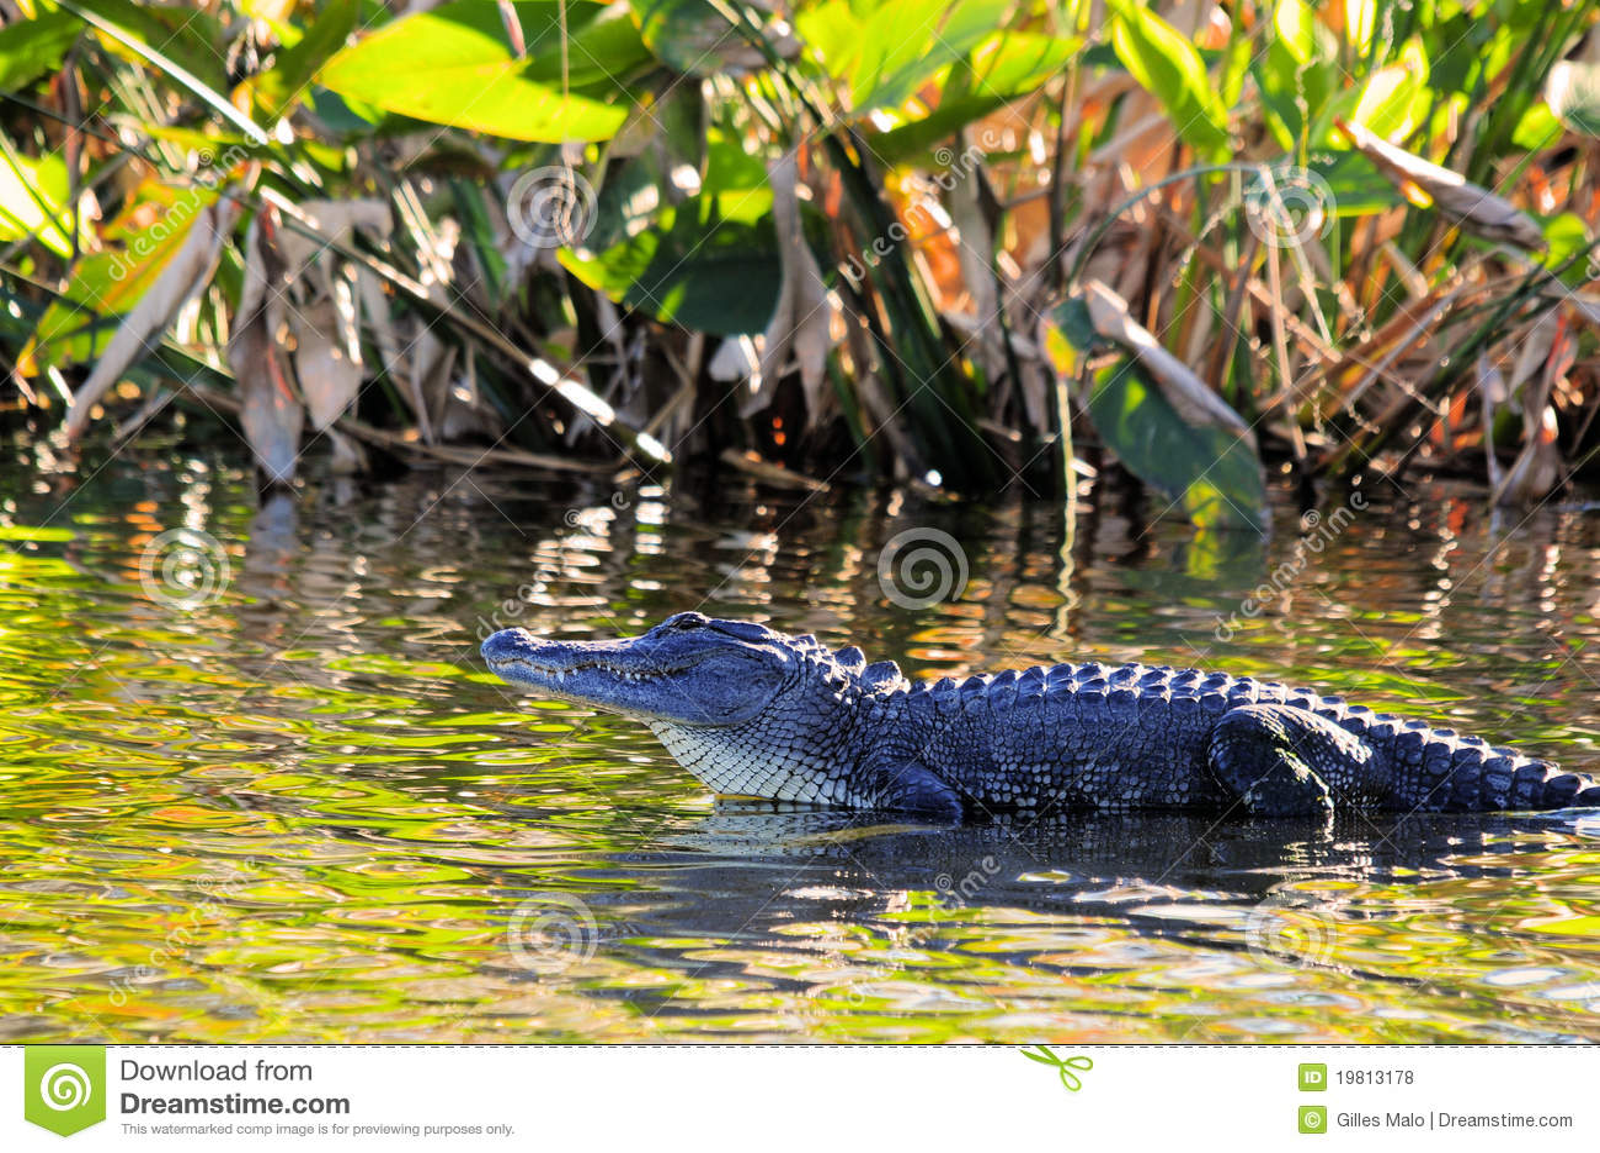 Coccodrillo in area umida